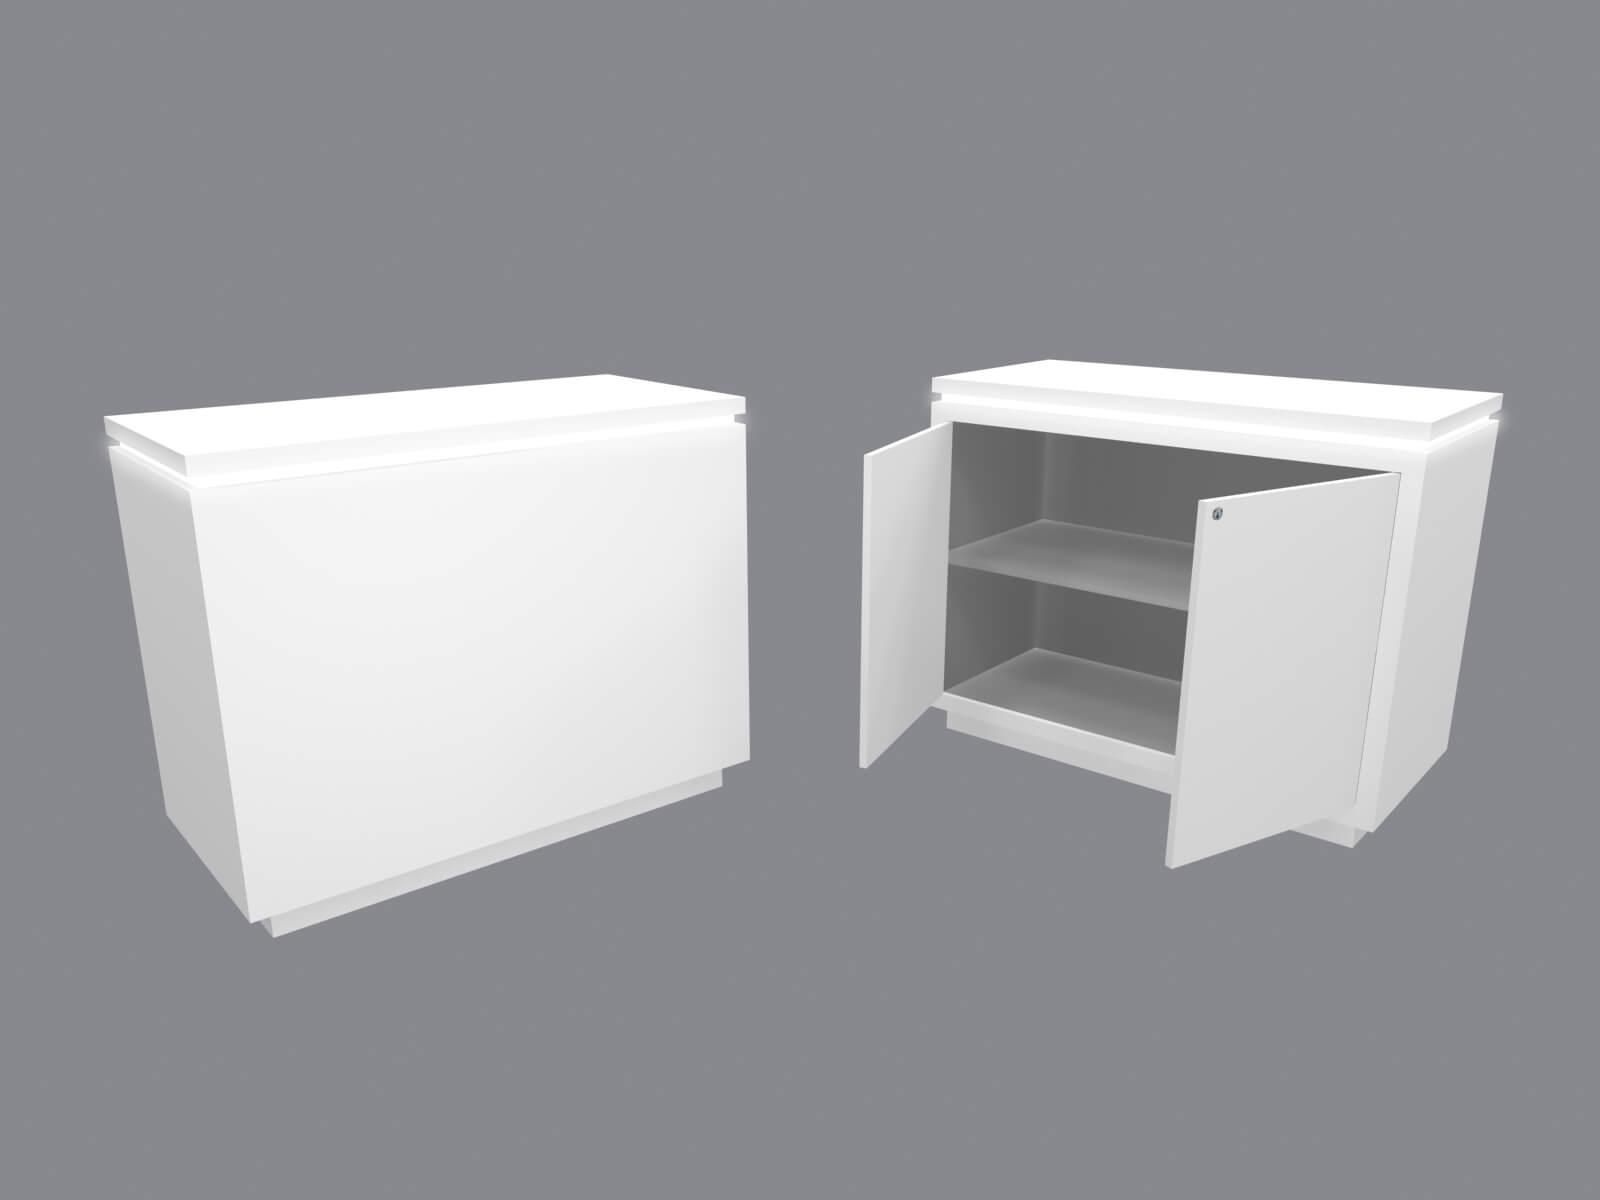 RE-1576 Trade Show Custom Rental Counter with Doors and Interior Shelf